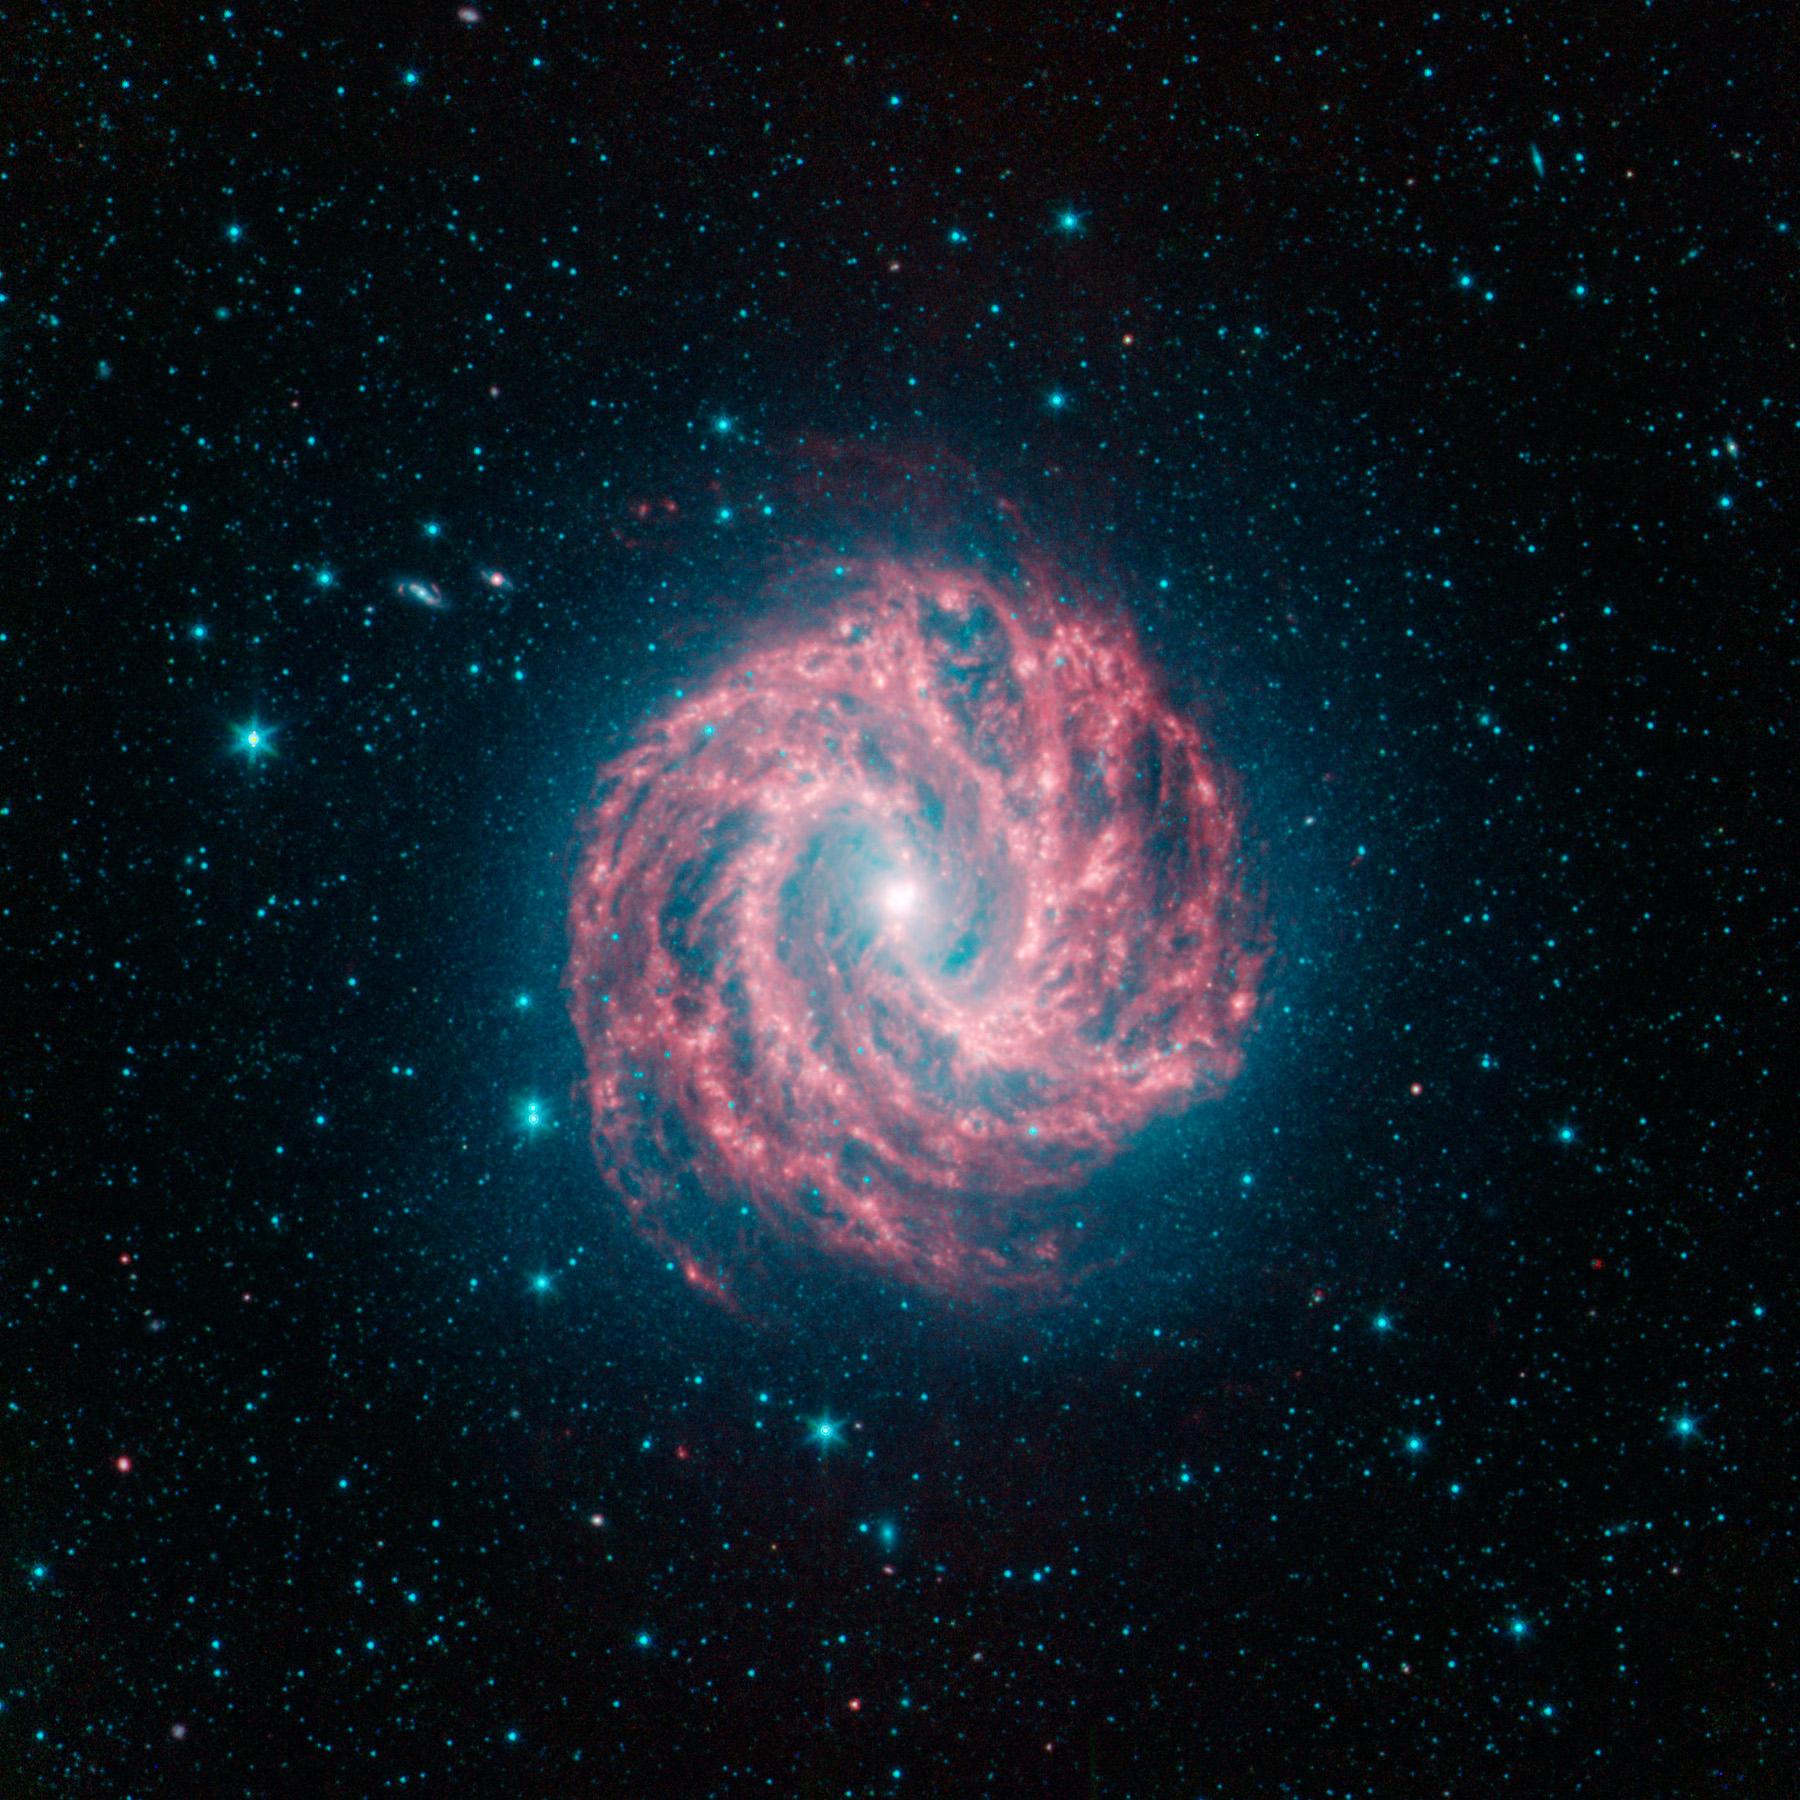 Spiral galaxy photo